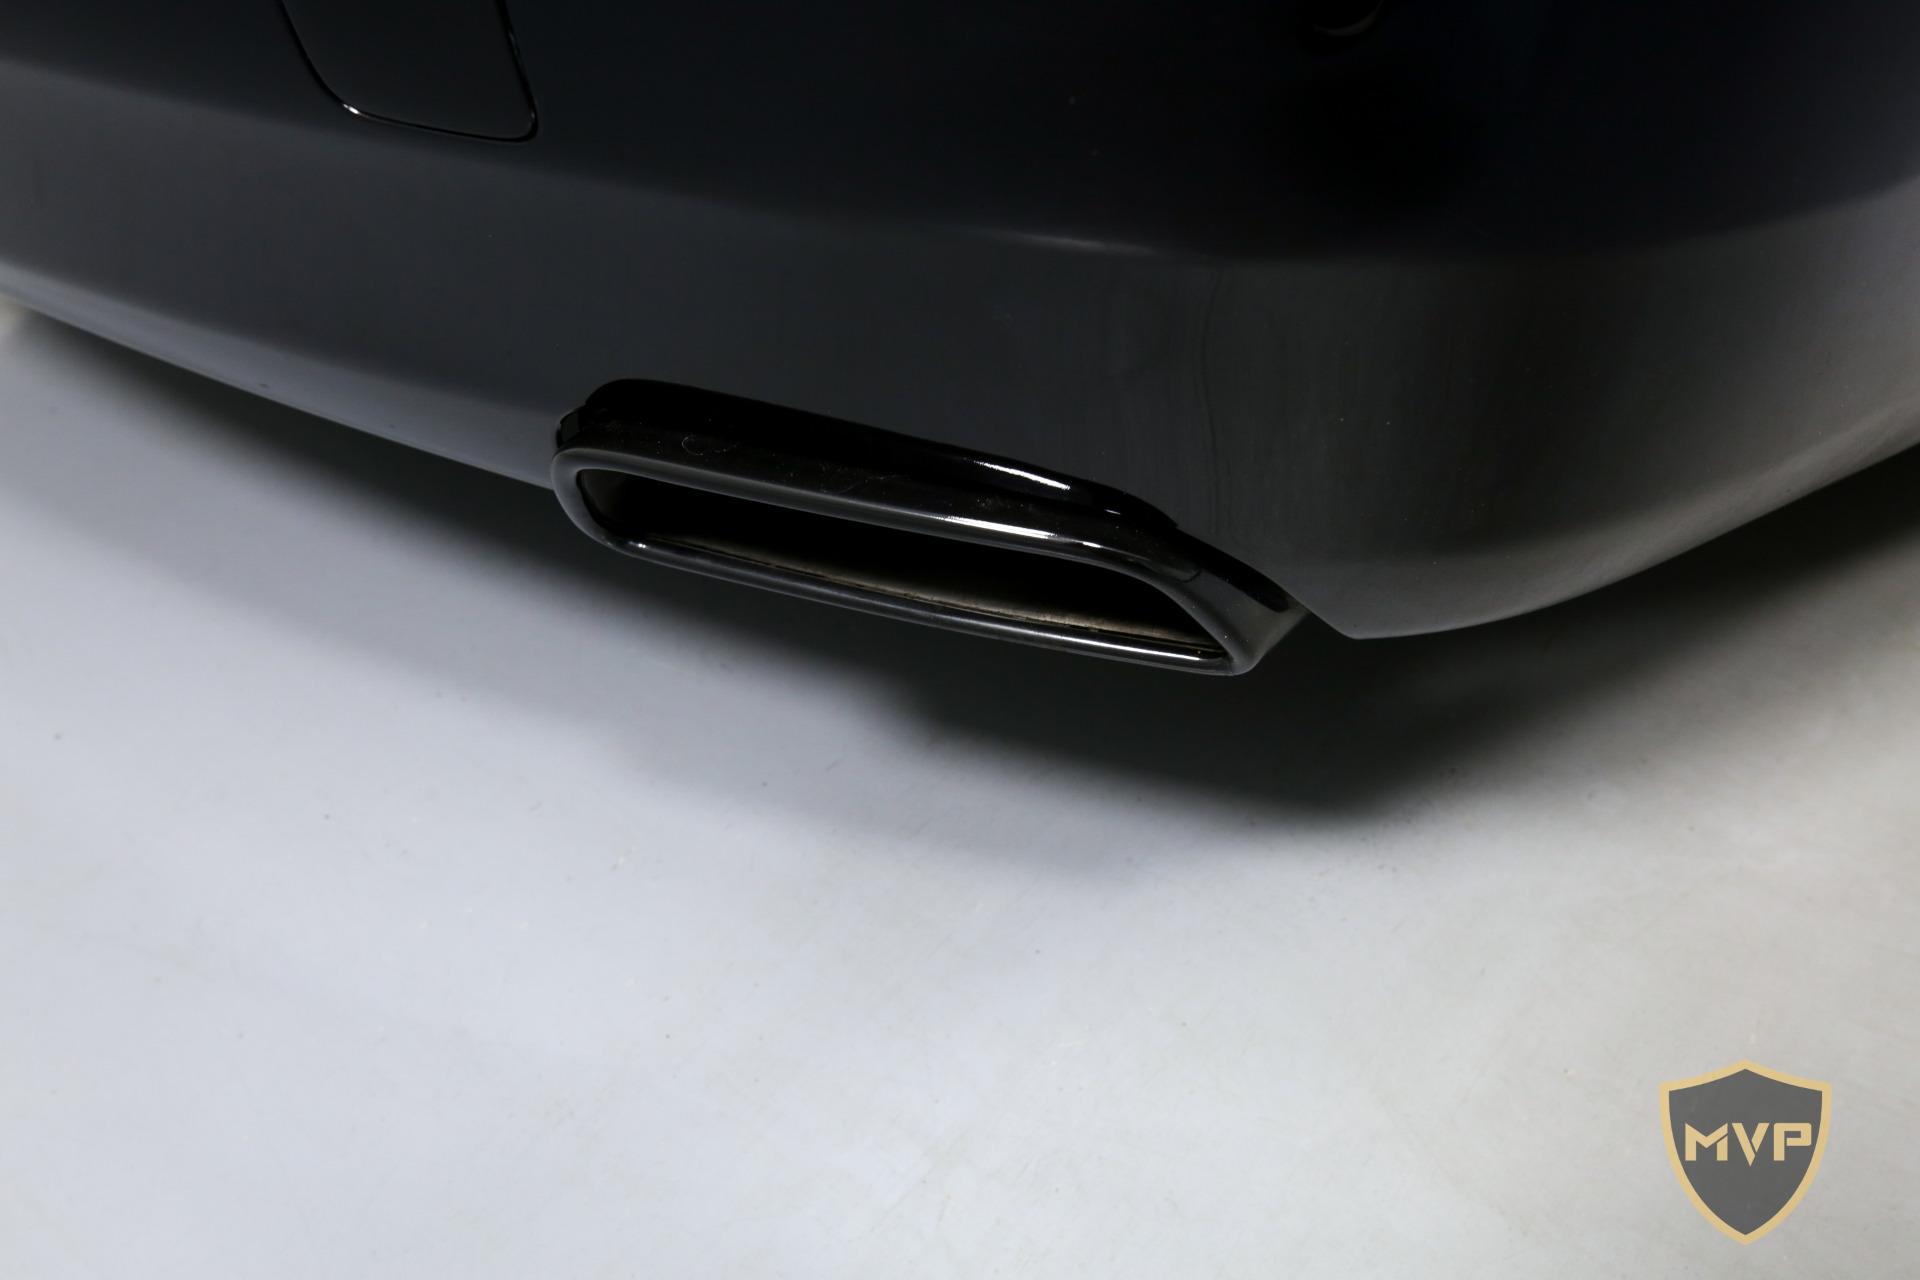 Used 2015 Rolls Royce Wraith For Sale 1 099 Mvp